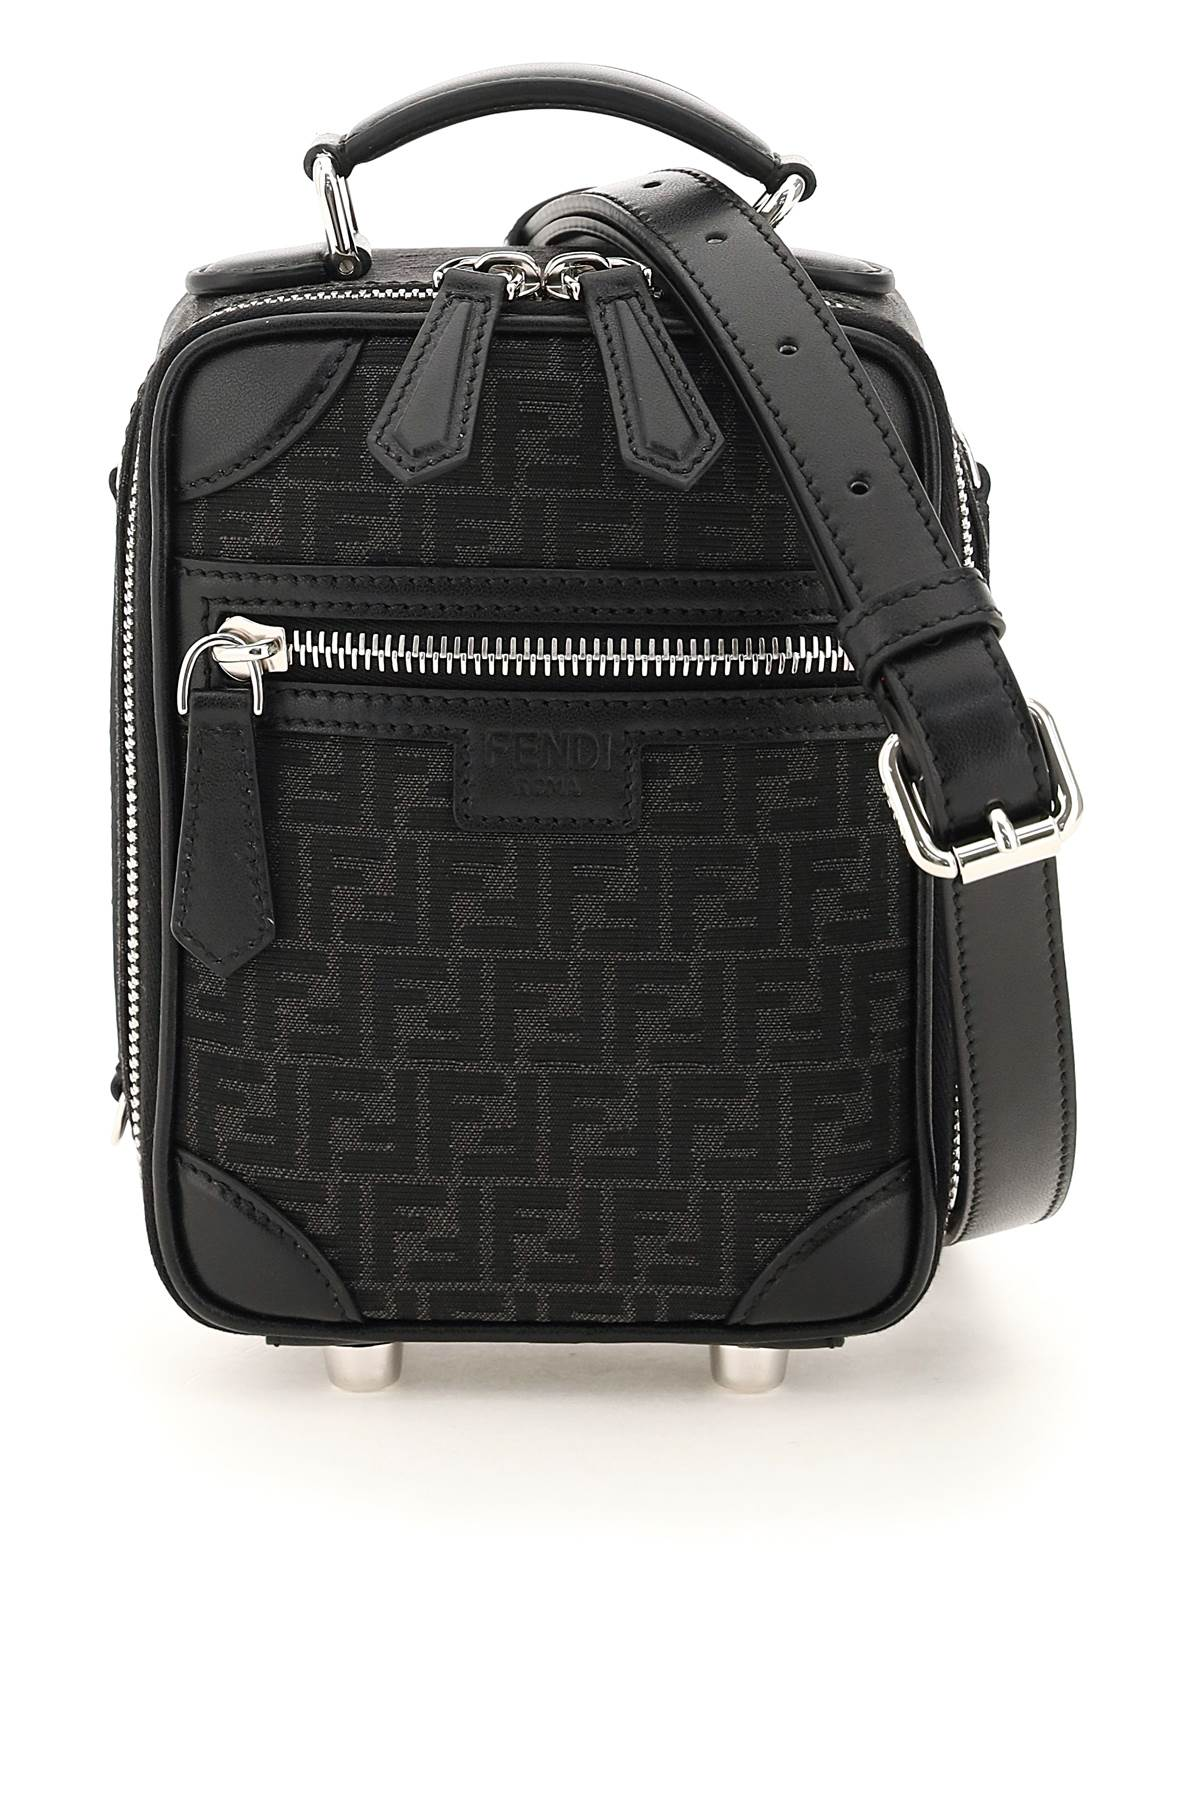 FENDI FF JACQUARD FABRIC MINI TRAVEL BAG OS Black Technical, Leather